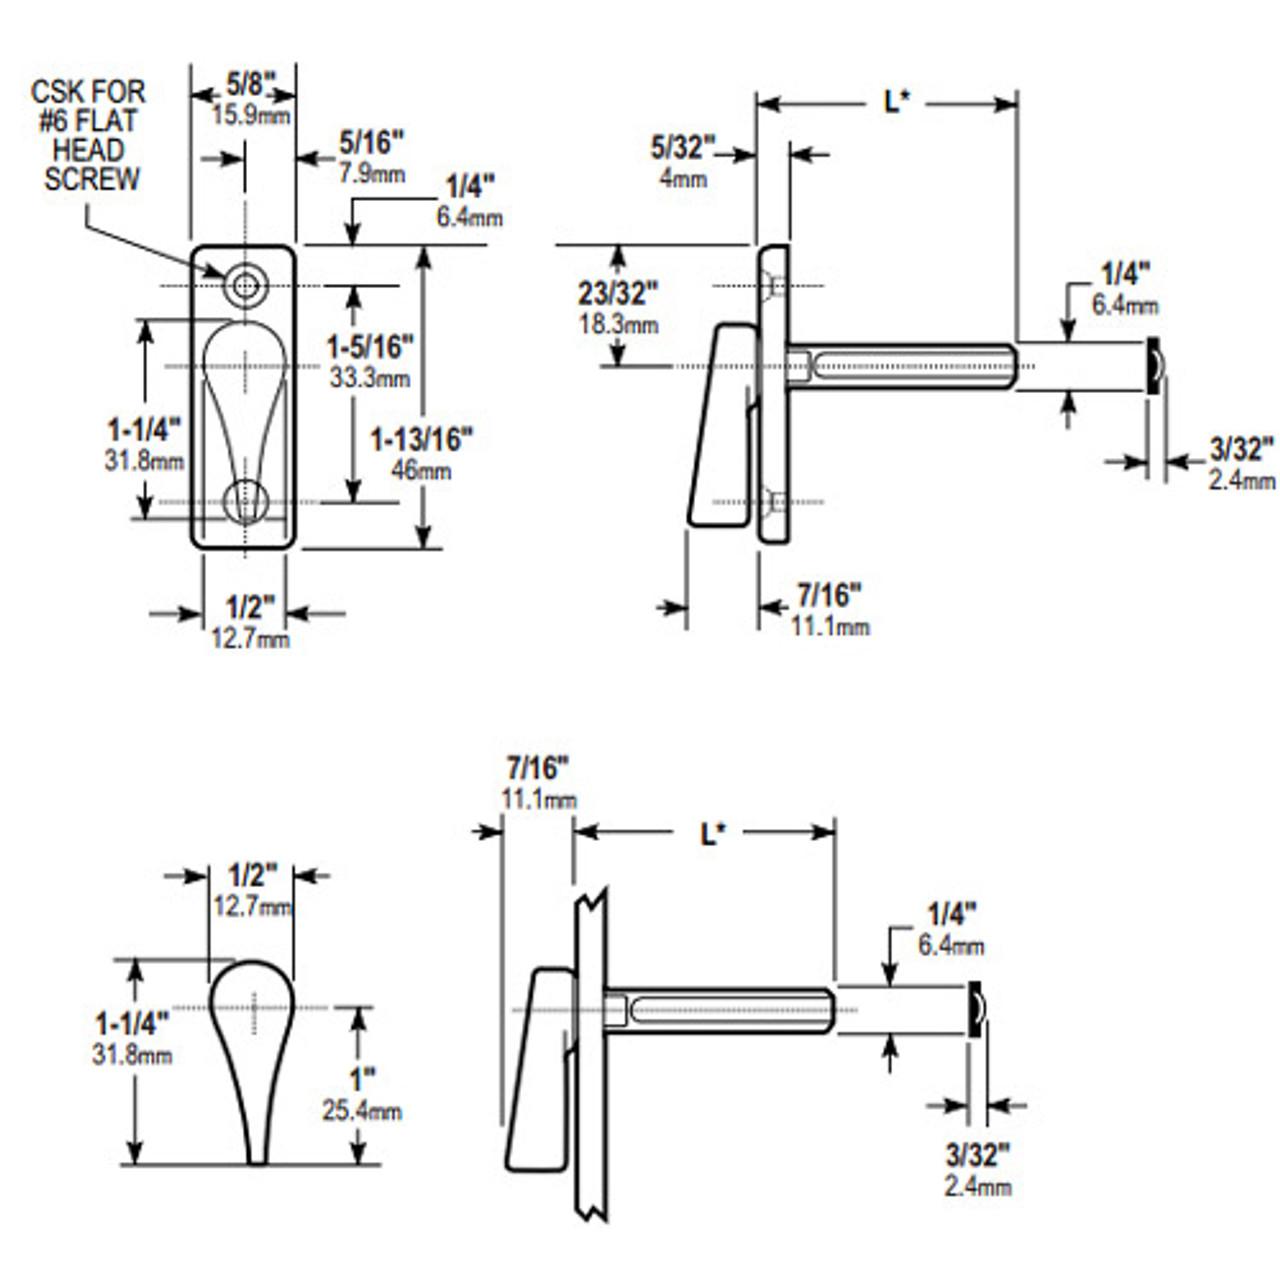 1000-02-15-121 Adams Rite 1000 Series Turns Dimensional View